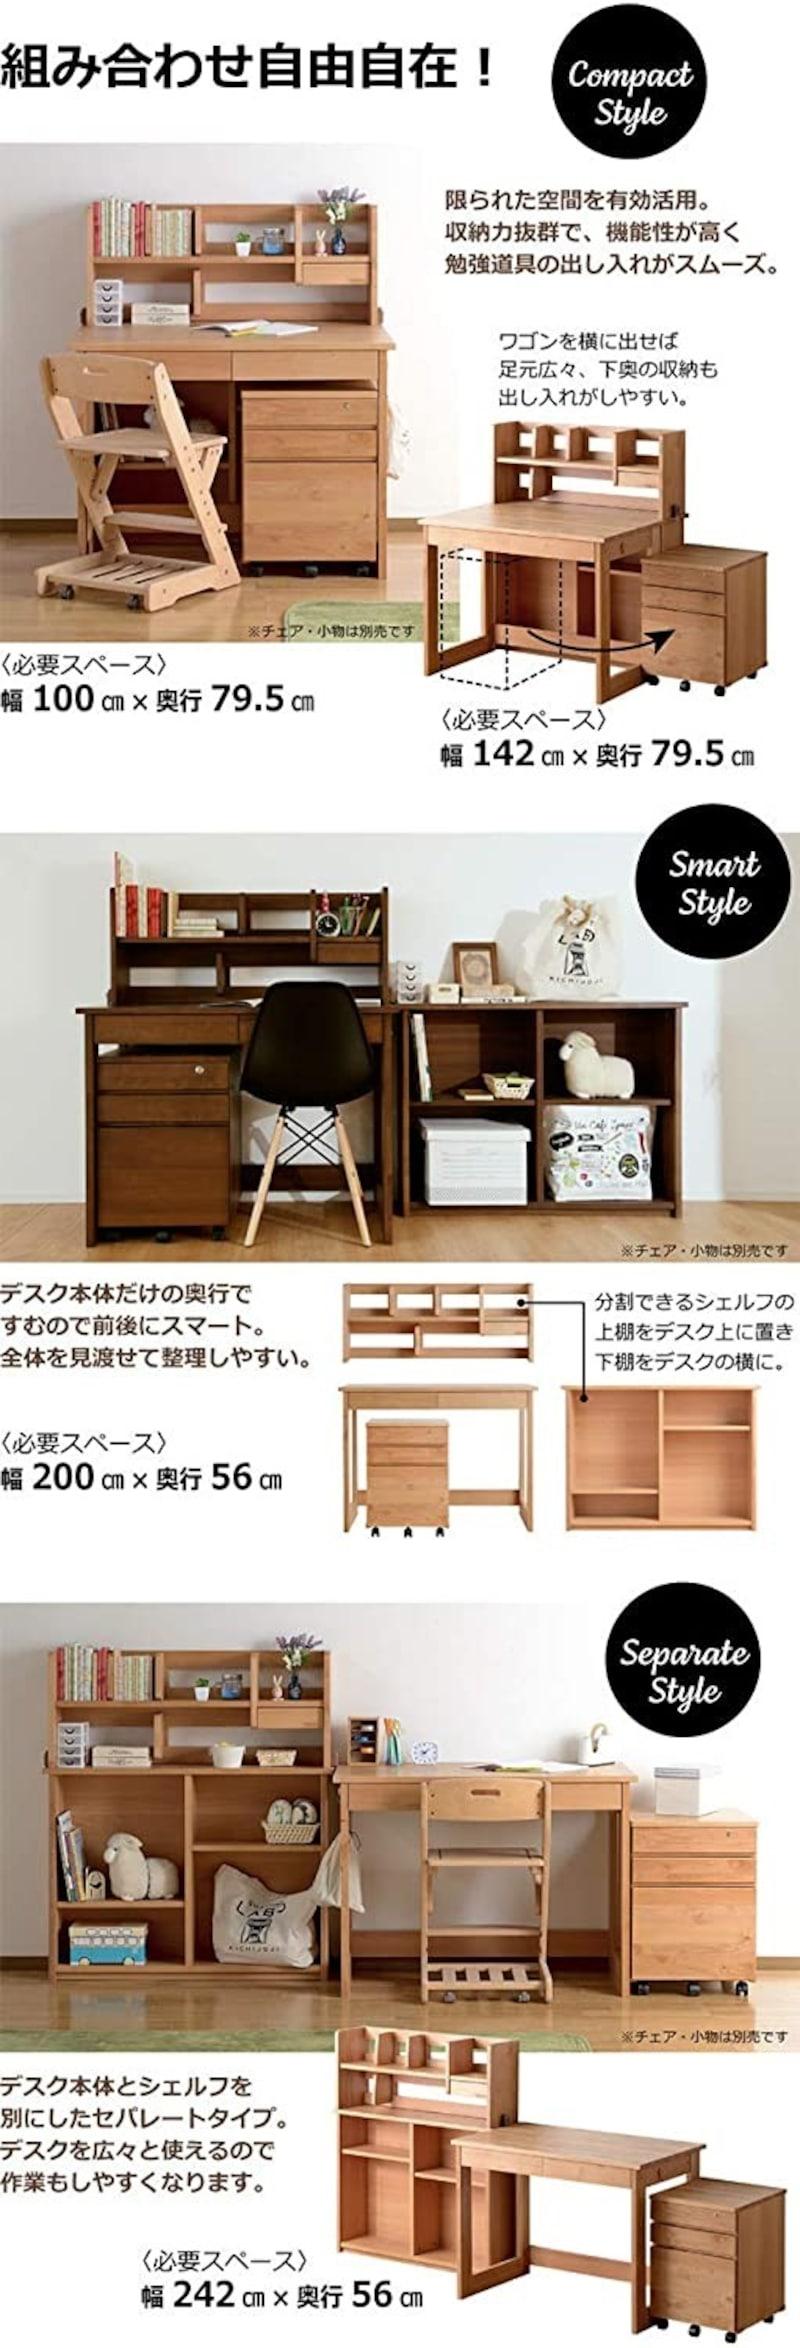 KAGU208,PATTY すくすくデスク,smk-0370